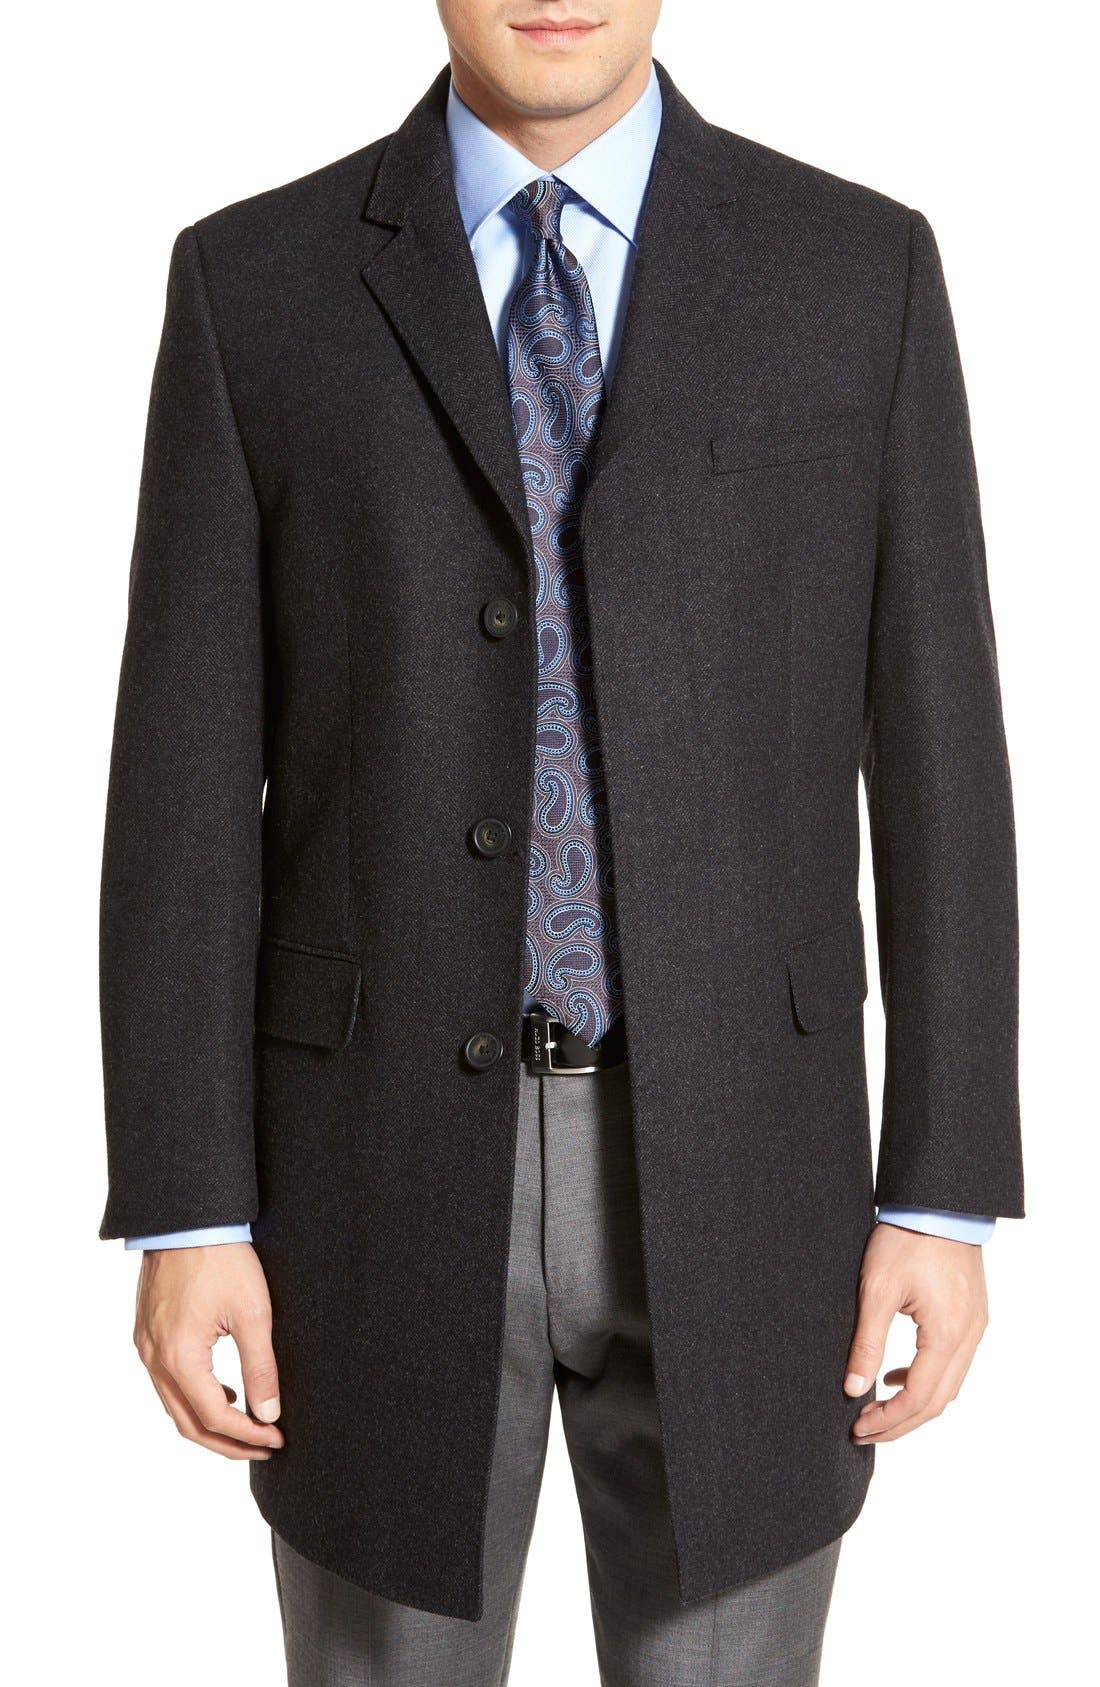 Maitland Modern Fit Wool Blend Overcoat,                             Main thumbnail 1, color,                             035